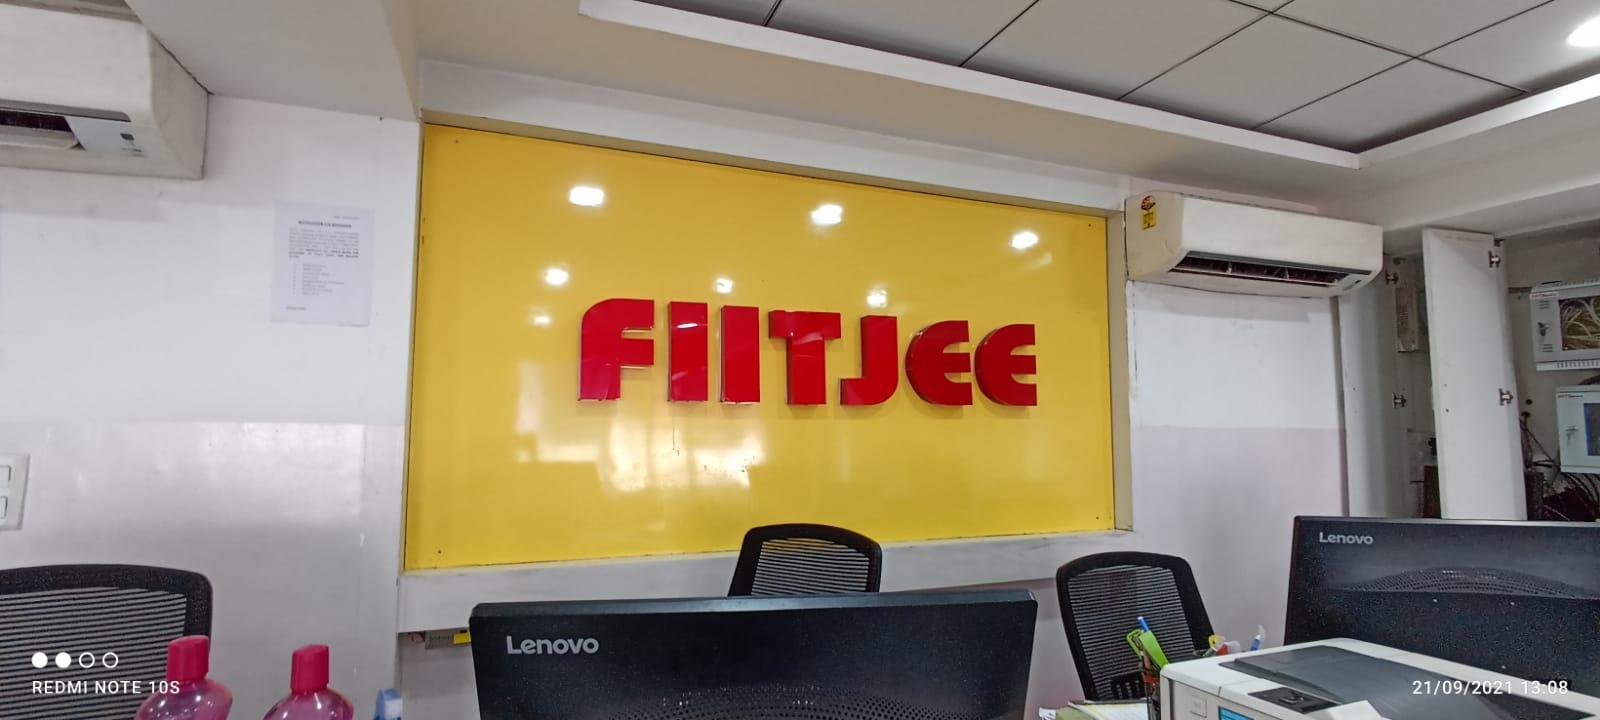 FIITJEE Gallery